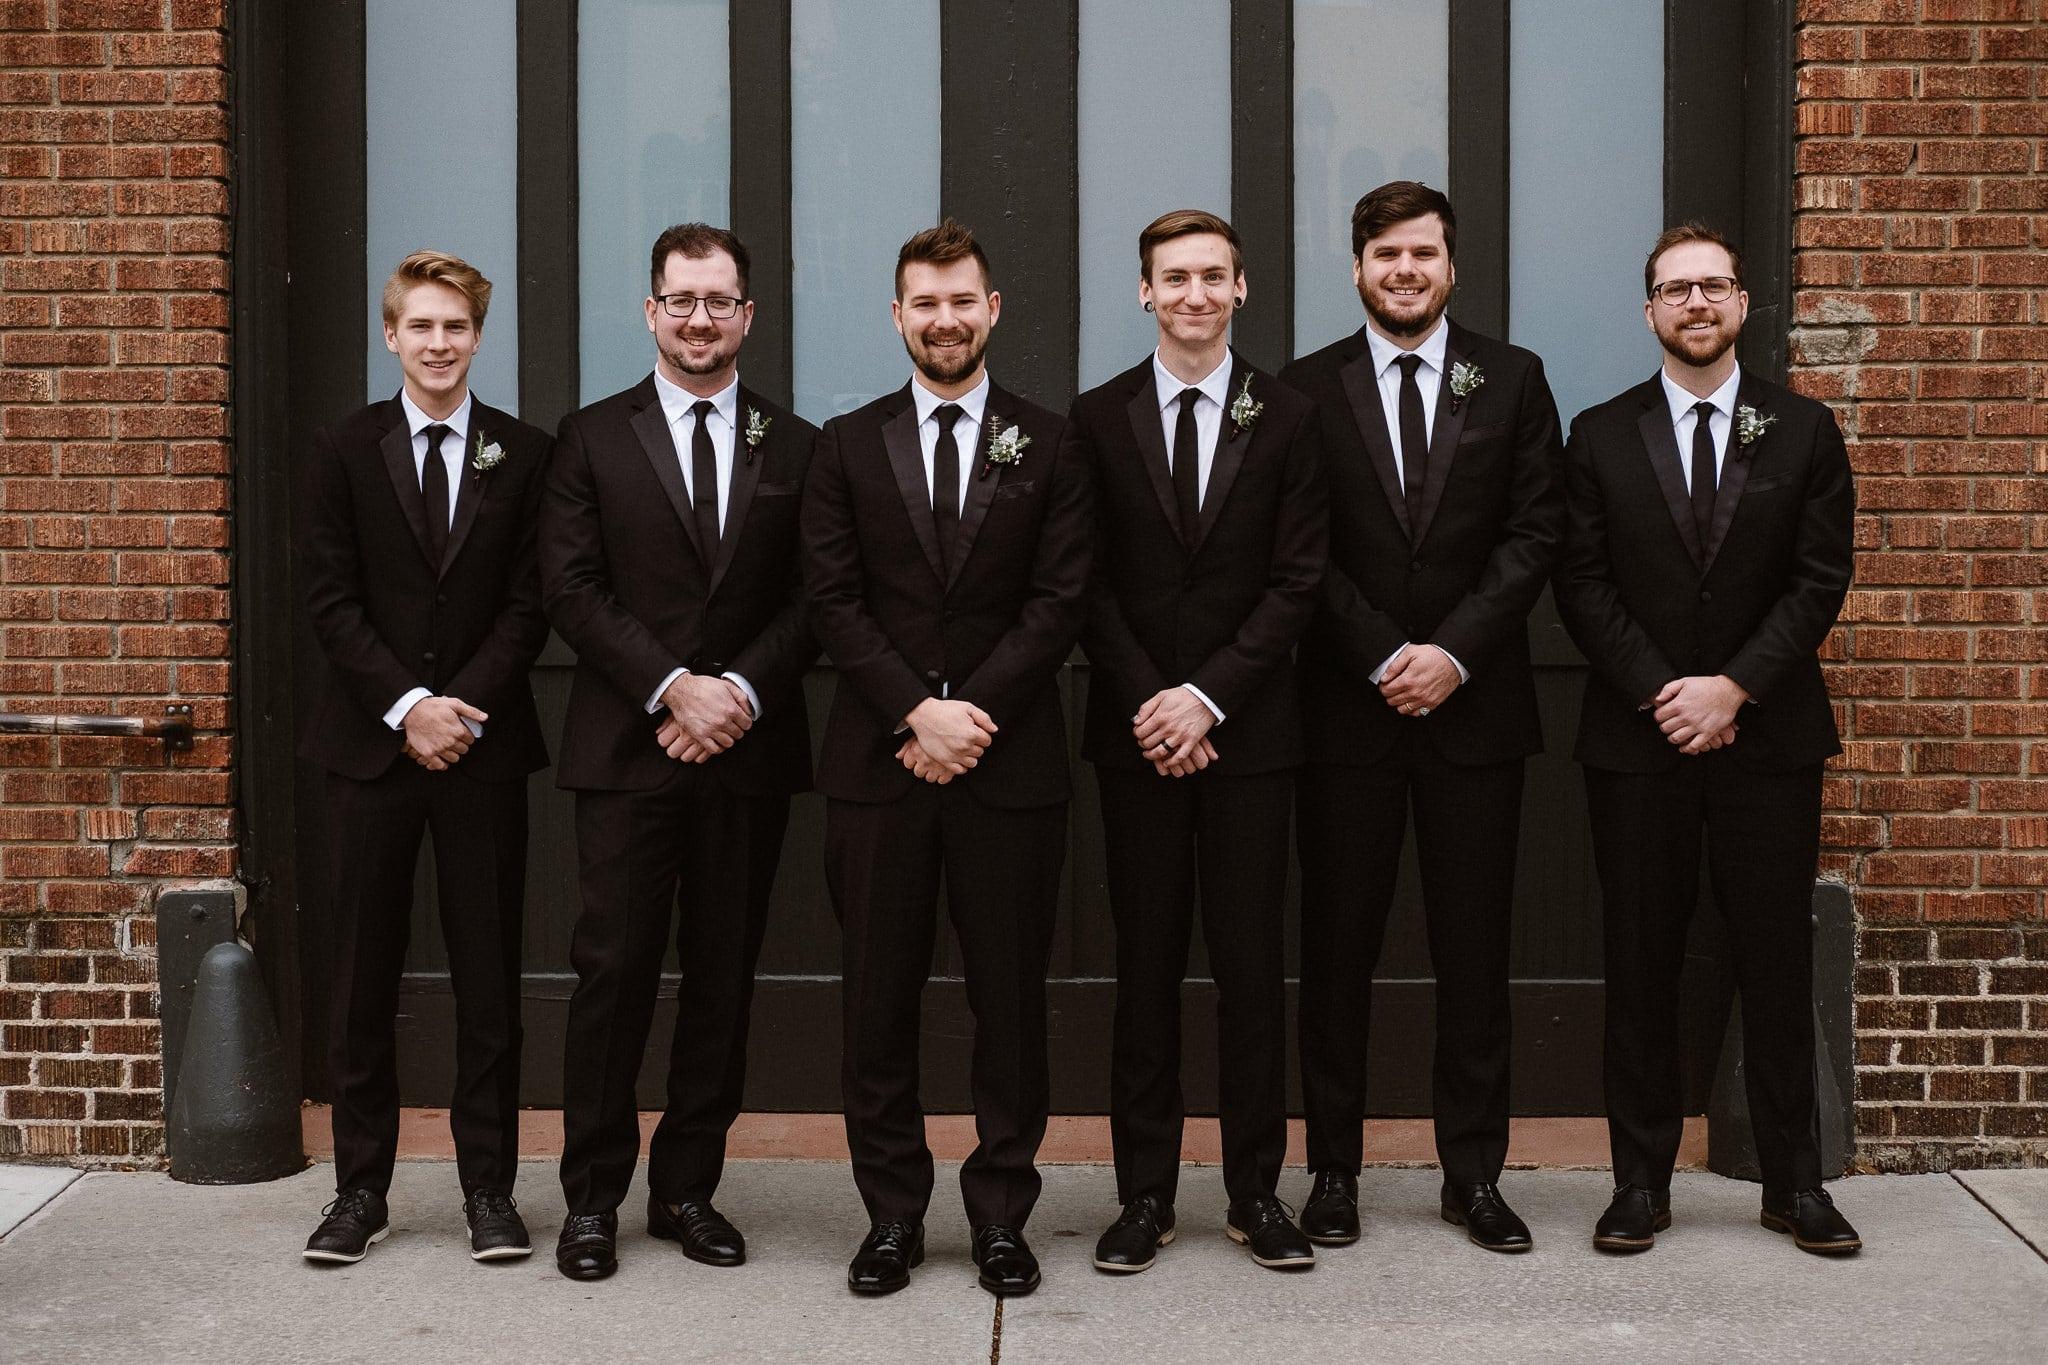 St Vrain Wedding Photographer | Longmont Wedding Photographer | Colorado Winter Wedding Photographer, Colorado industrial chic wedding, groom with groomsmen, black suits and black ties